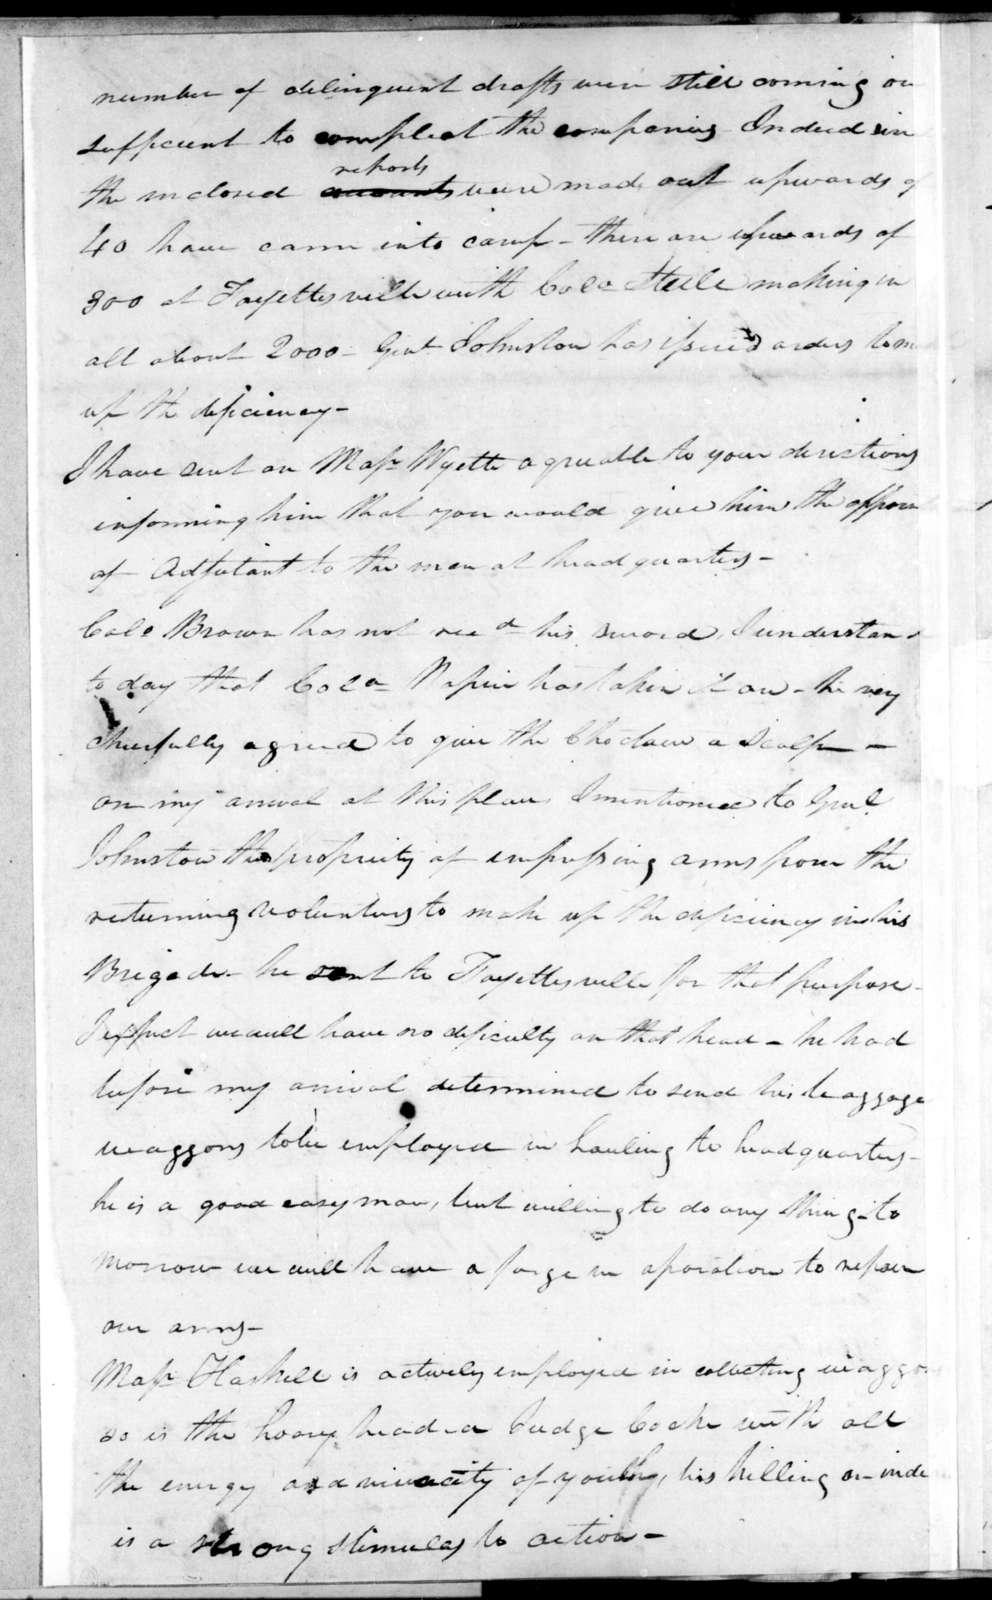 William Carroll to Andrew Jackson, February 9, 1814